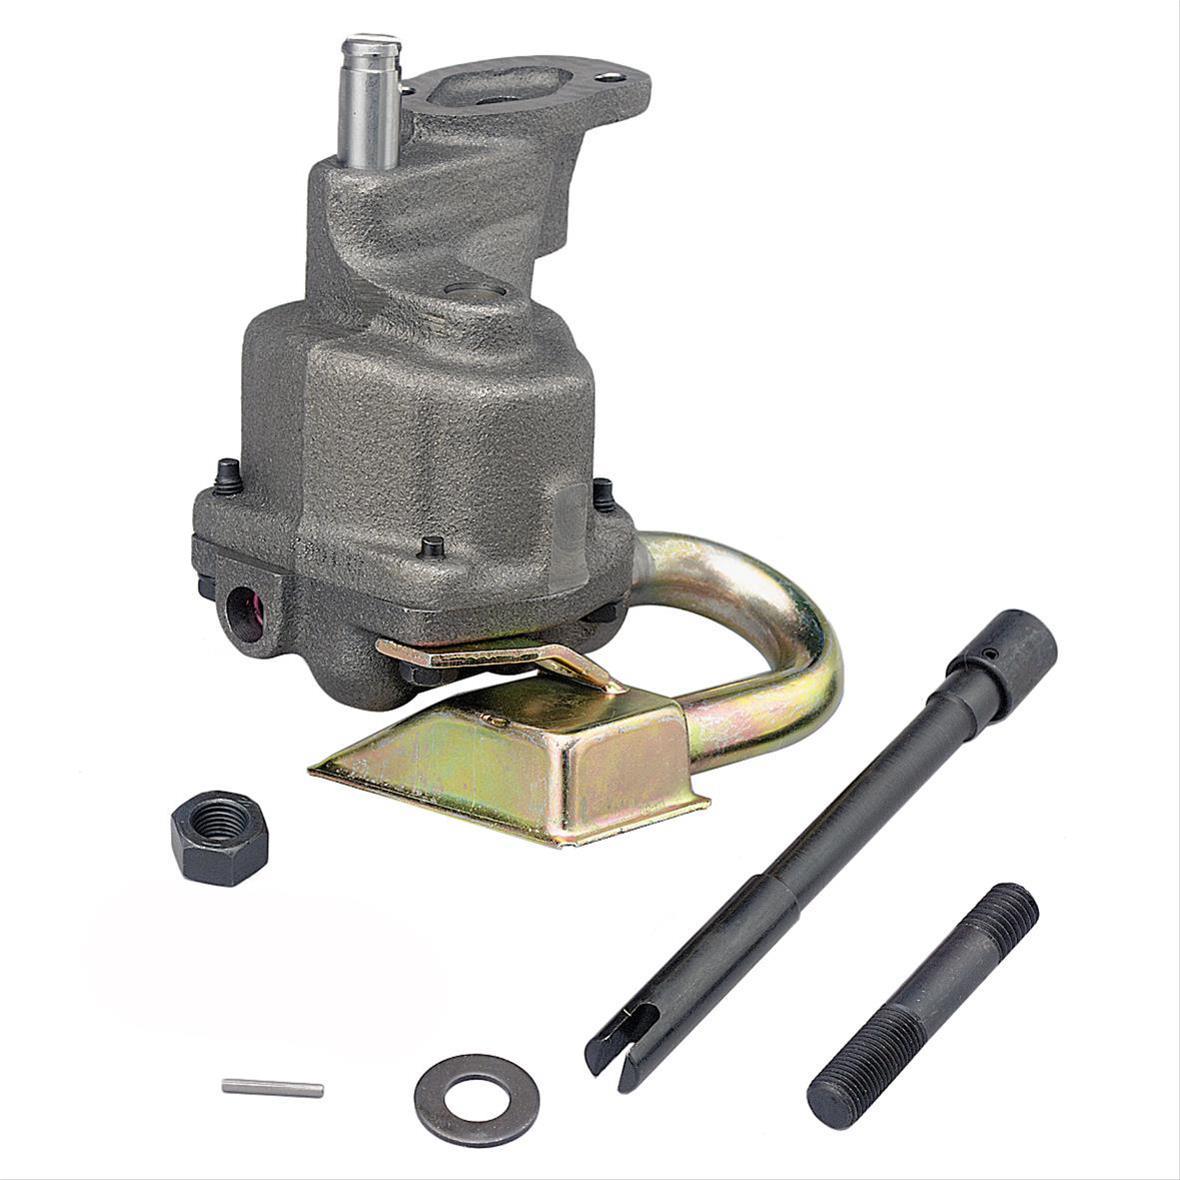 Crane Cams 99010-1 Oil Pump Primer for Chevrolet